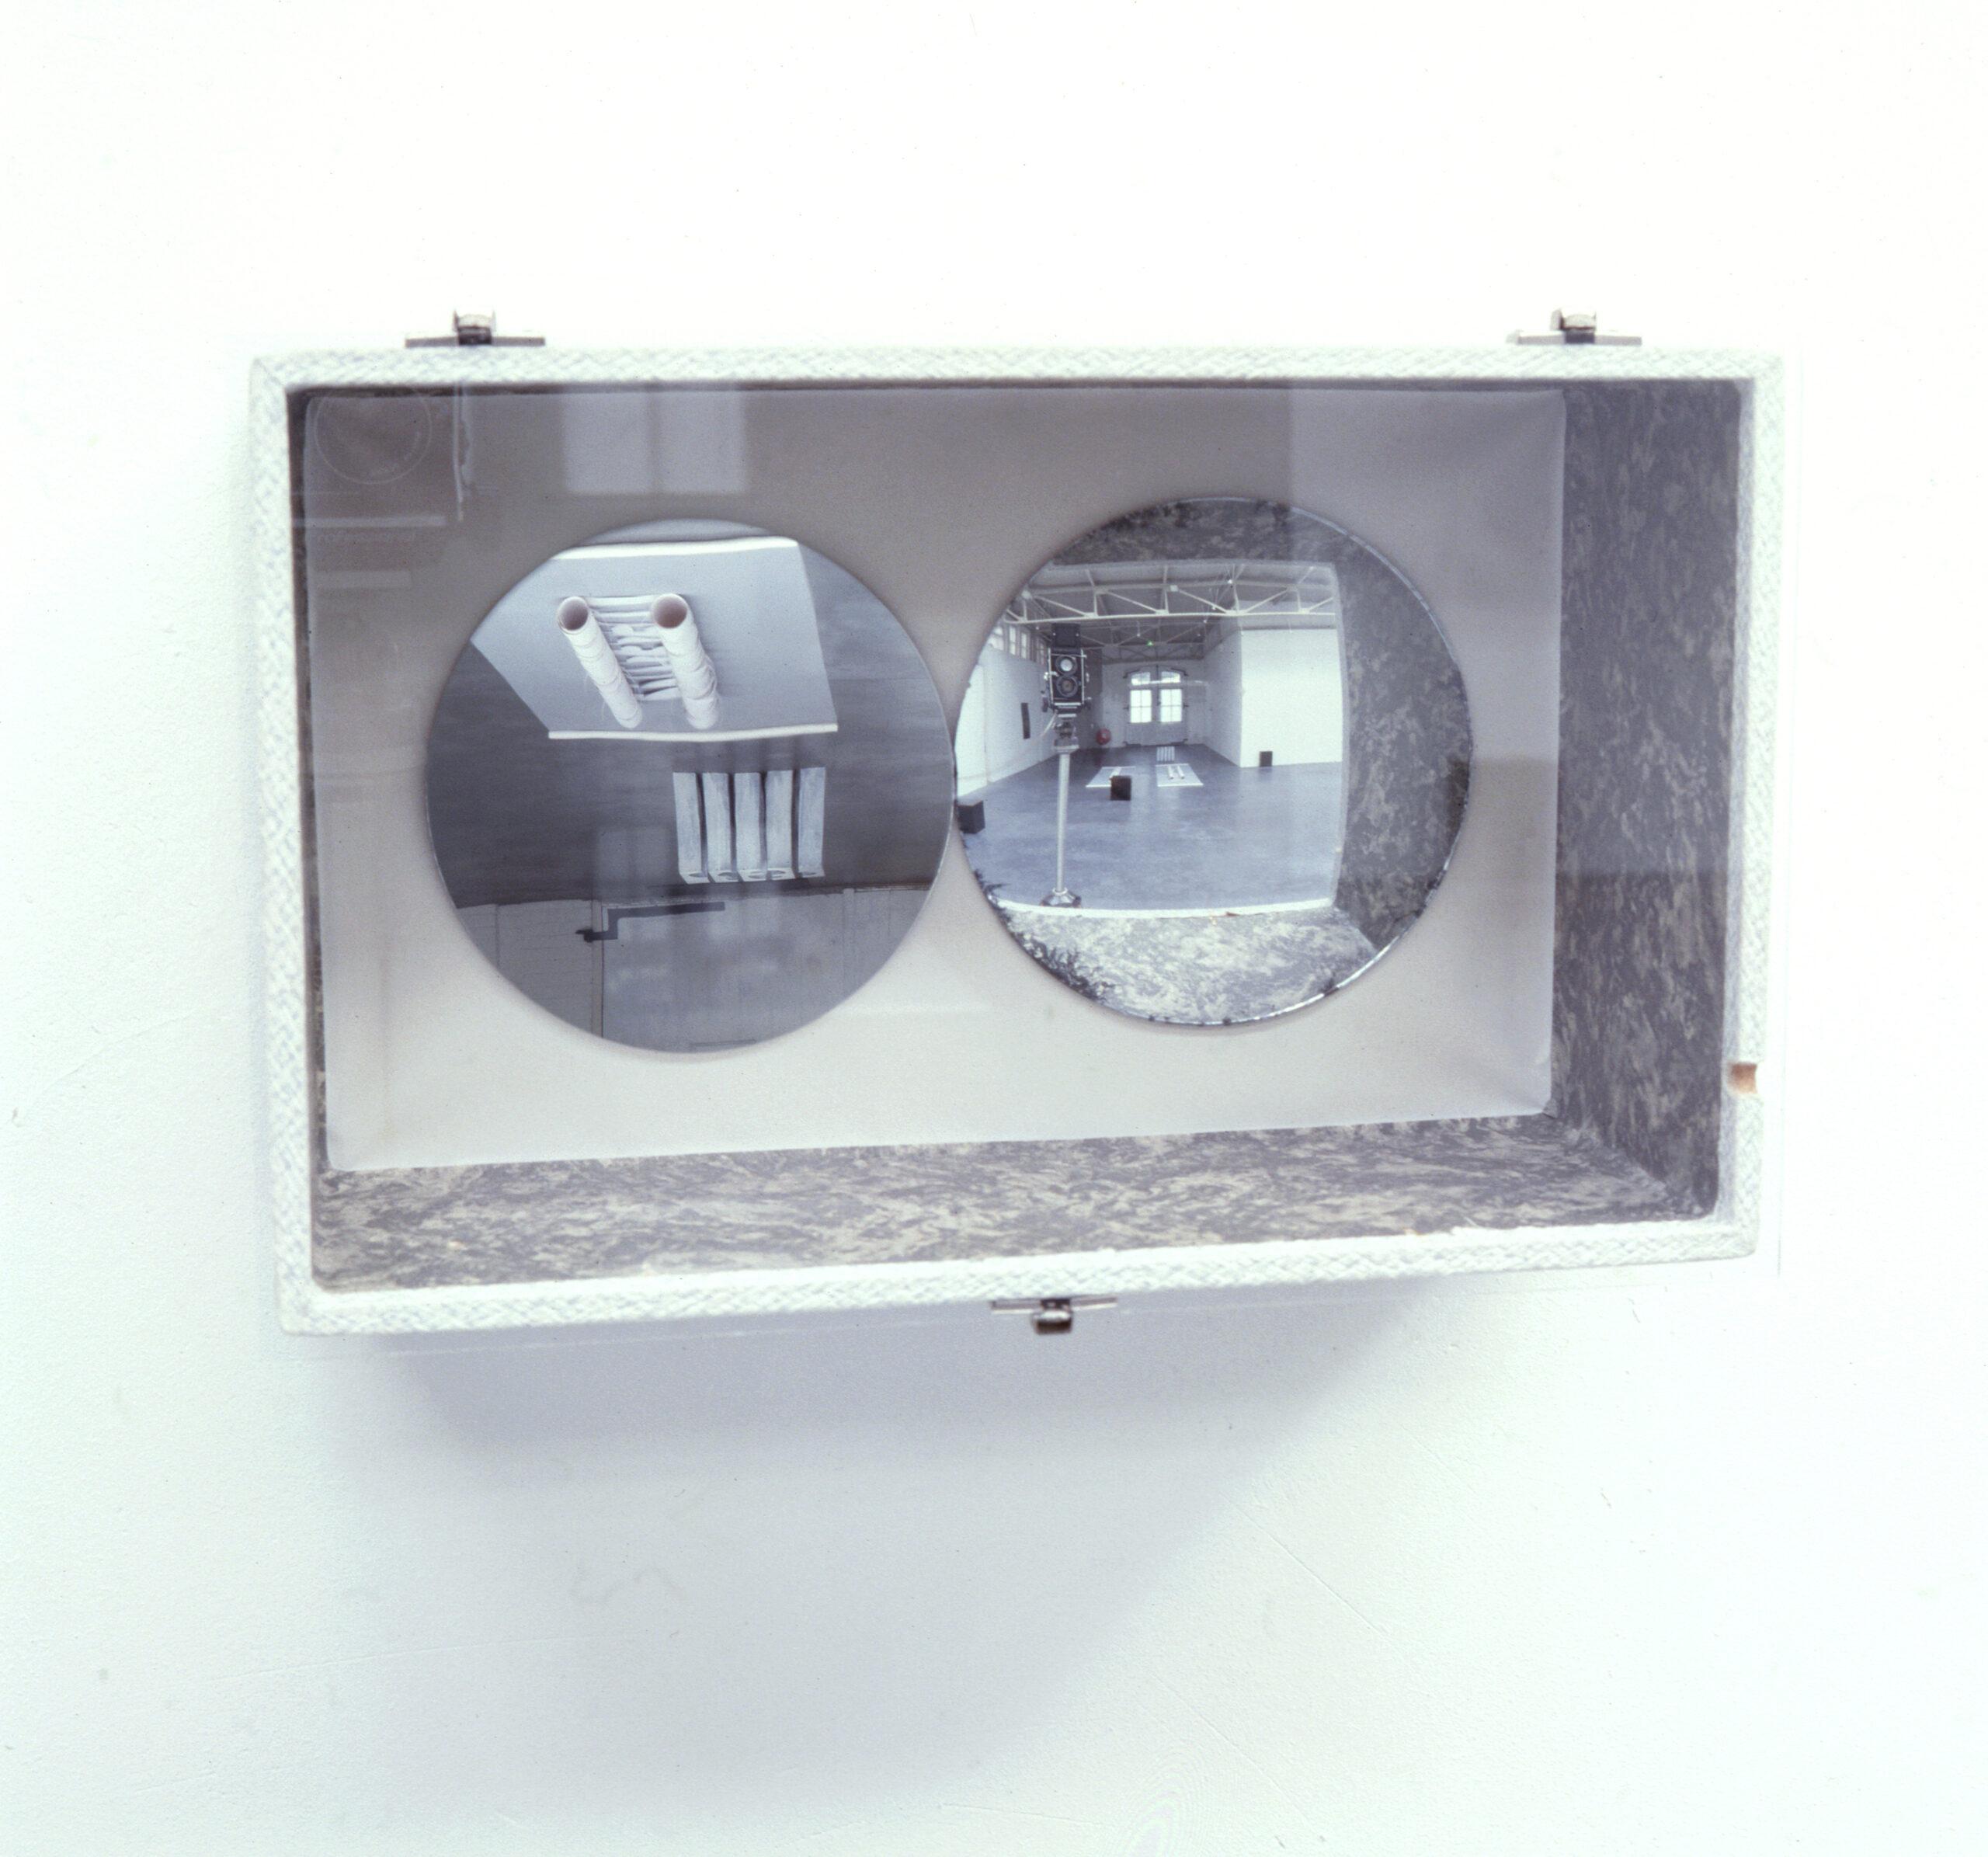 Wido Blokland, 'Sohum #1' – 2000